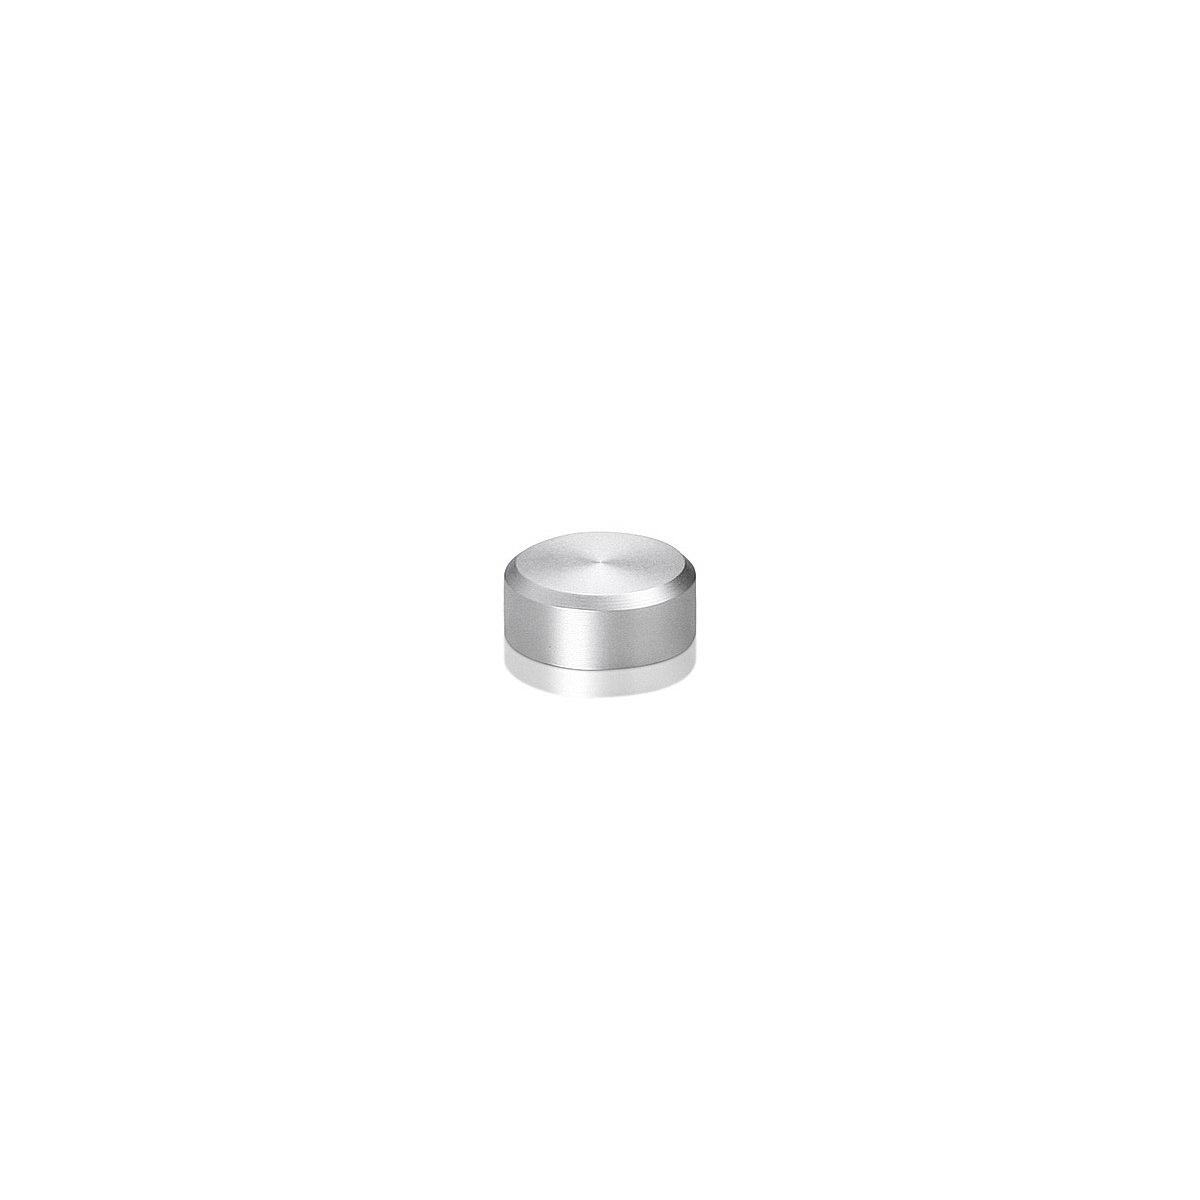 (4) CAP058025A, (4) S058-05025A Clear Anodized Aluminum